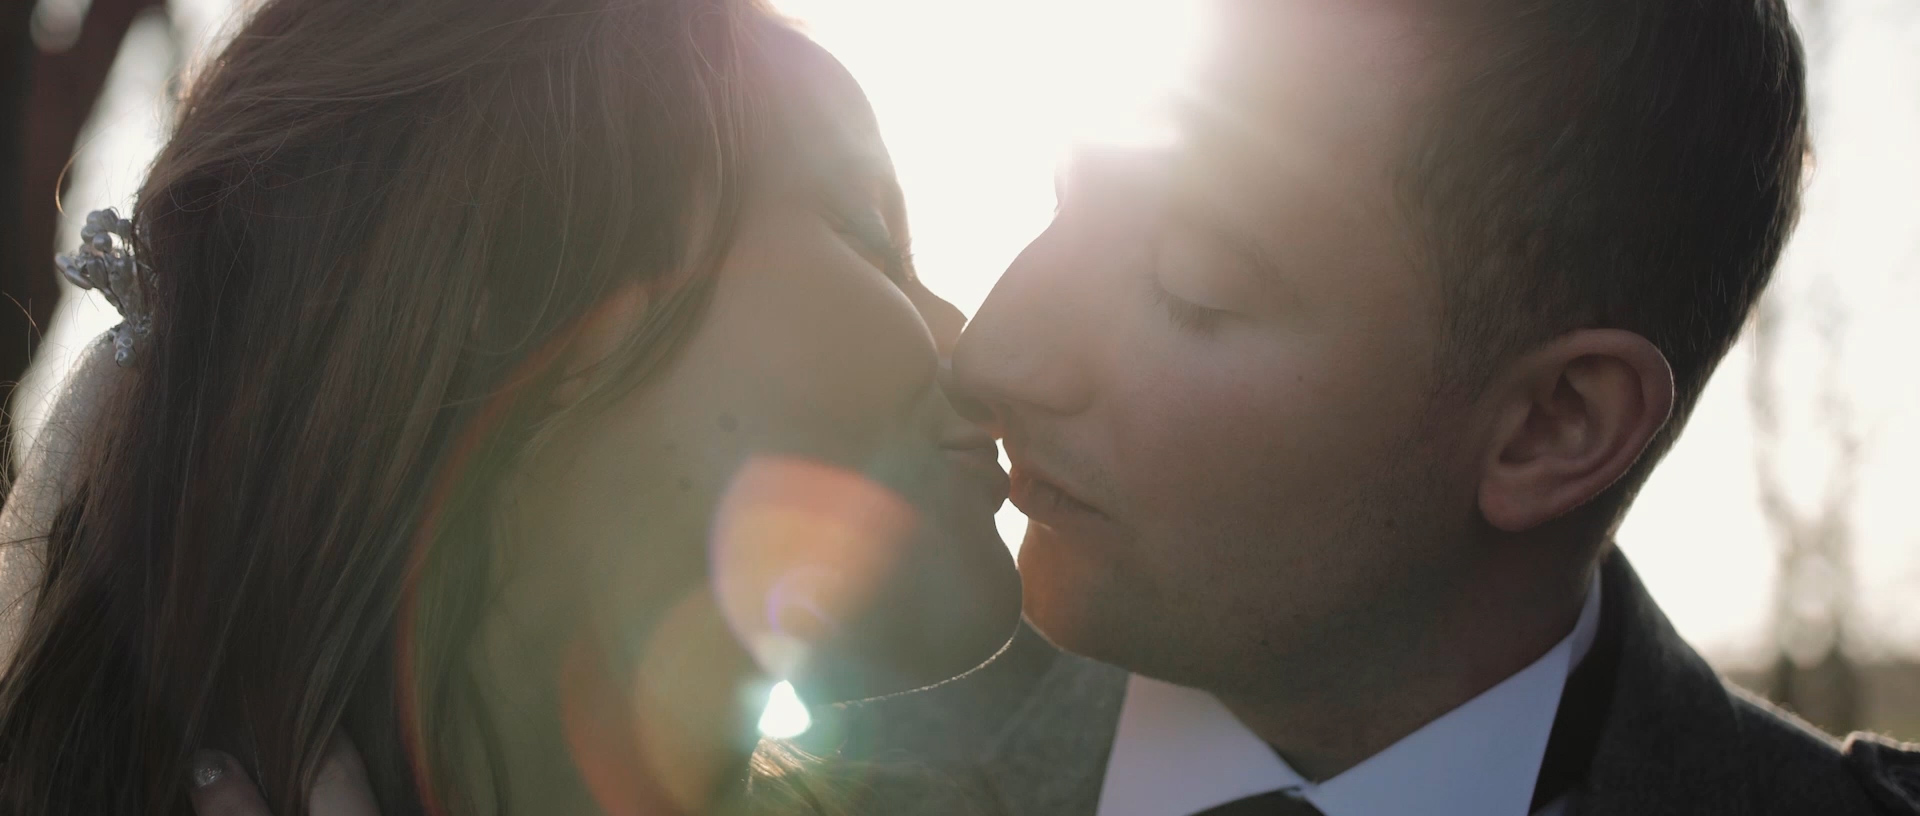 ardanaiseig-wedding-videographer_LL_03.jpg